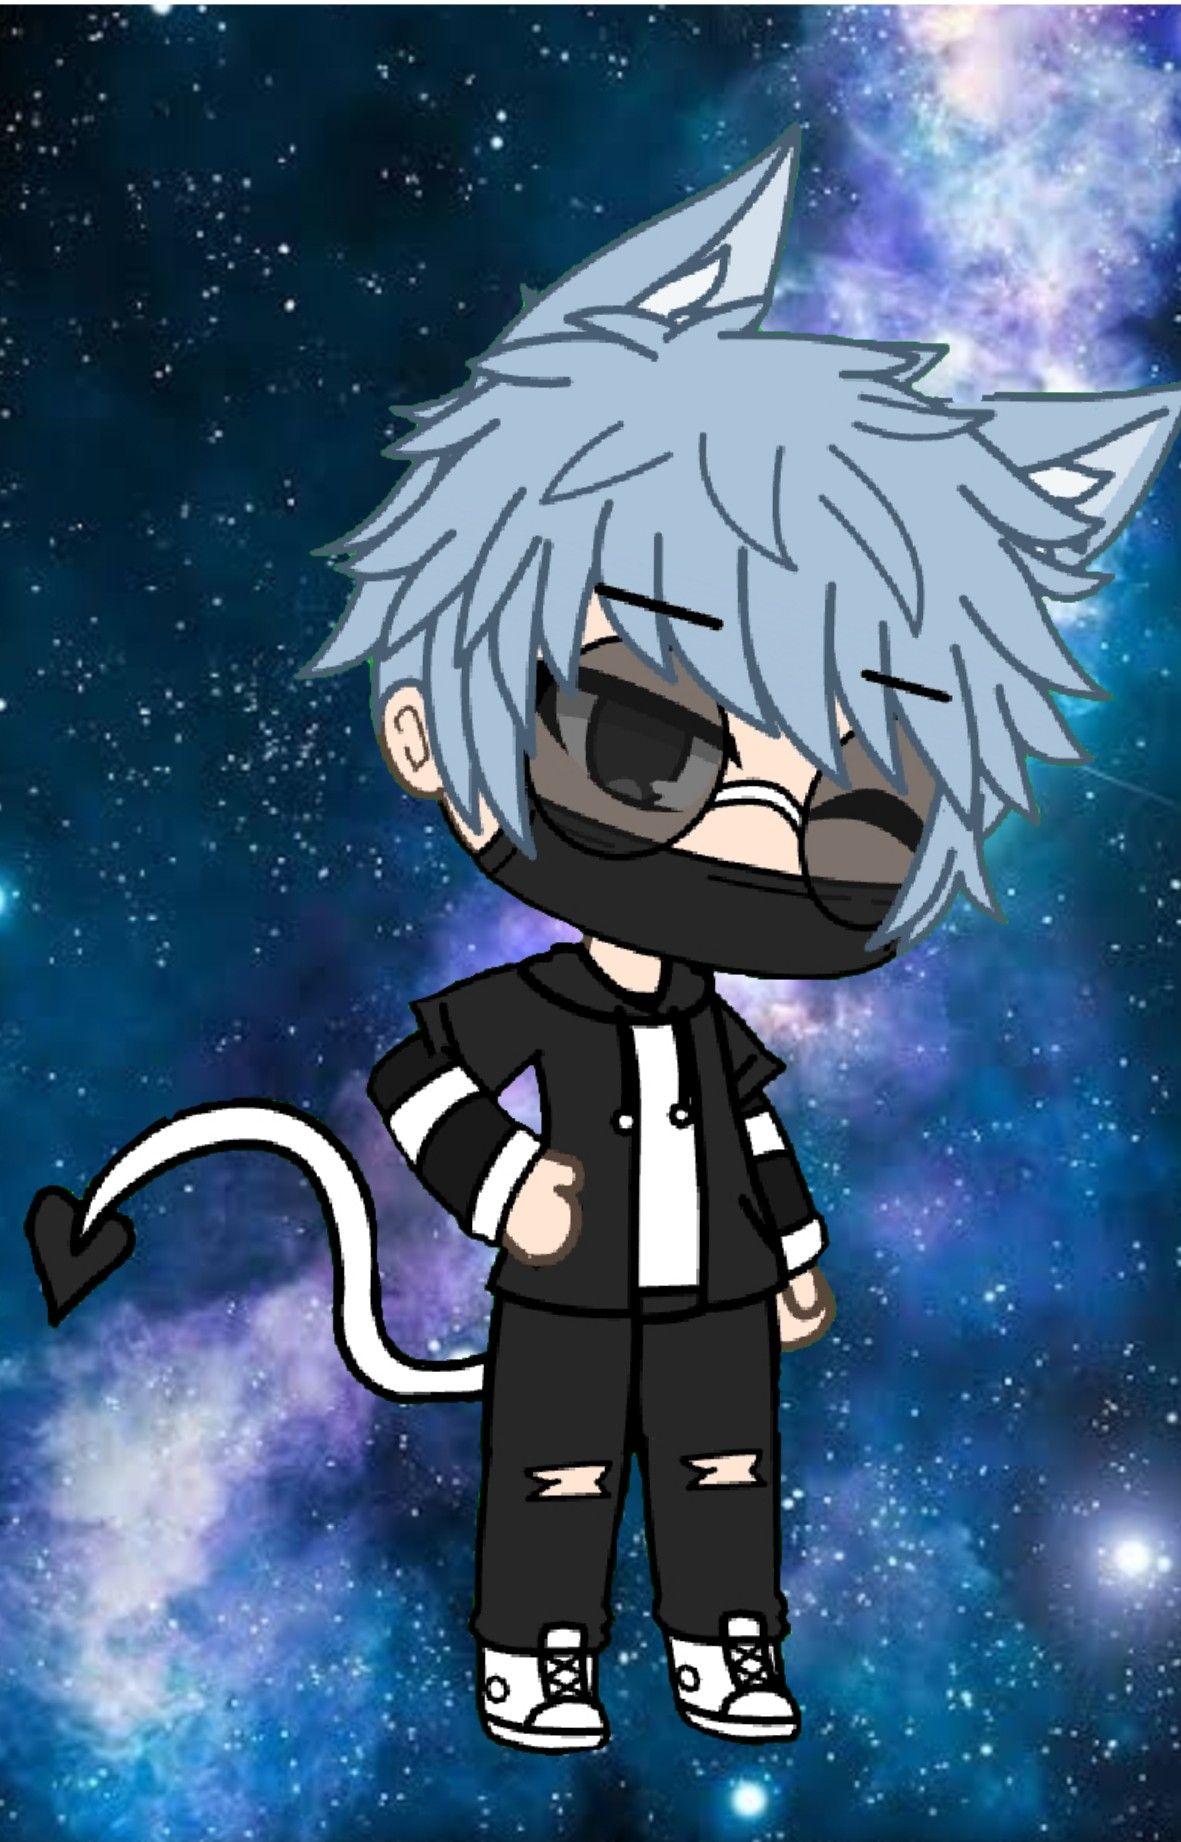 Gacha Life Konbin Anime Wolf Girl Cute Anime Character Cute Wild Animals